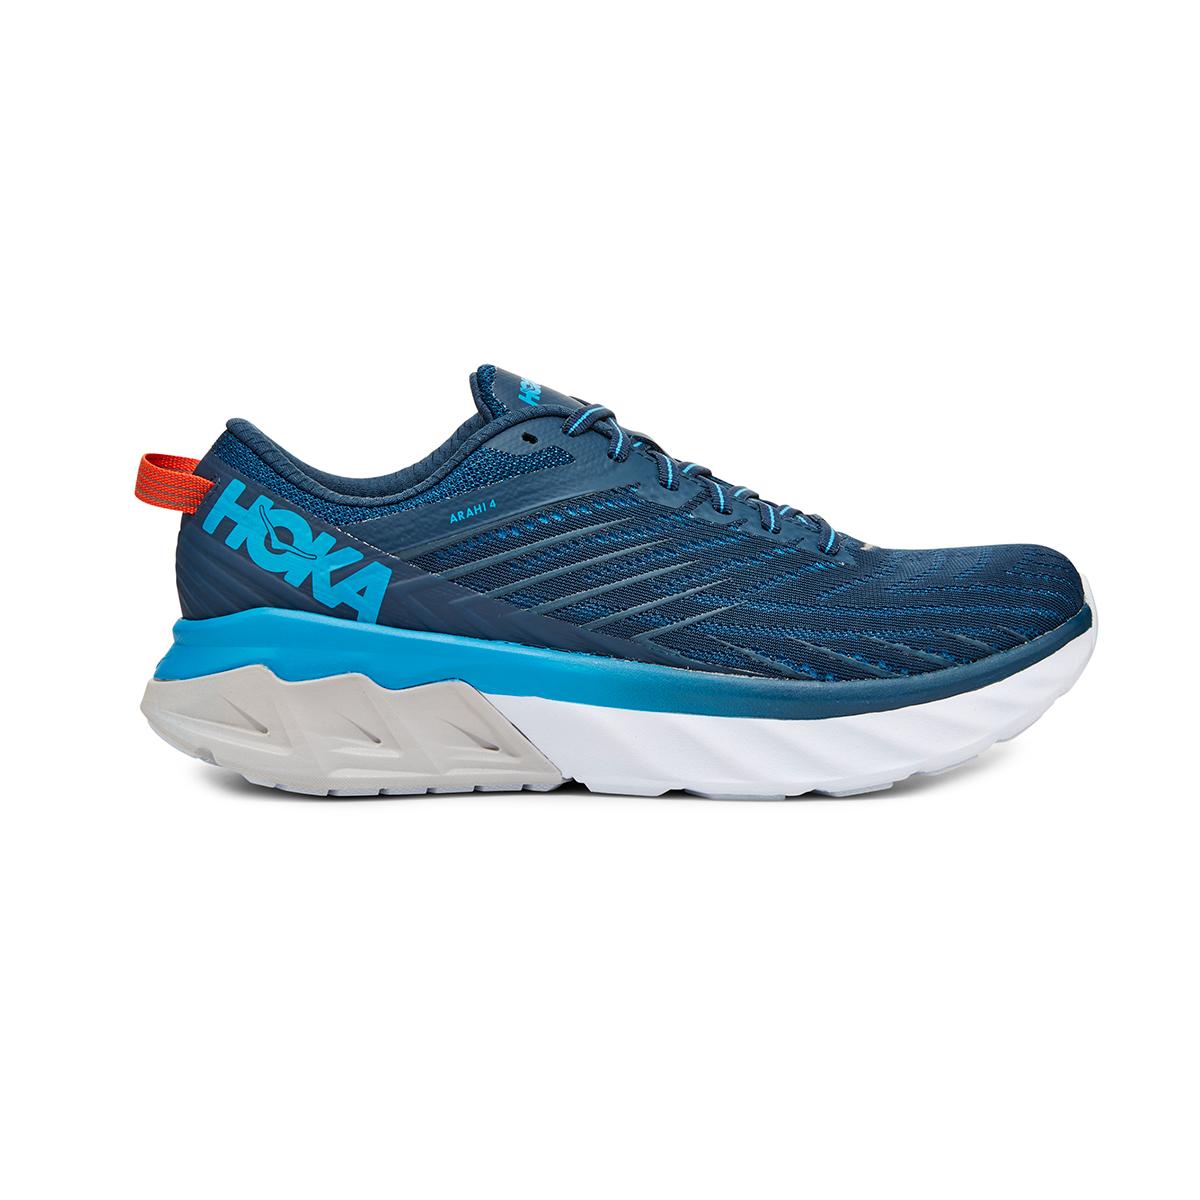 Men's Hoka One One Arahi 4 Running Shoe - Color: Majolica Blue/Dresden Blue (Regular Width) - Size: 15, Majolica Blue/Dresden Blue, large, image 1